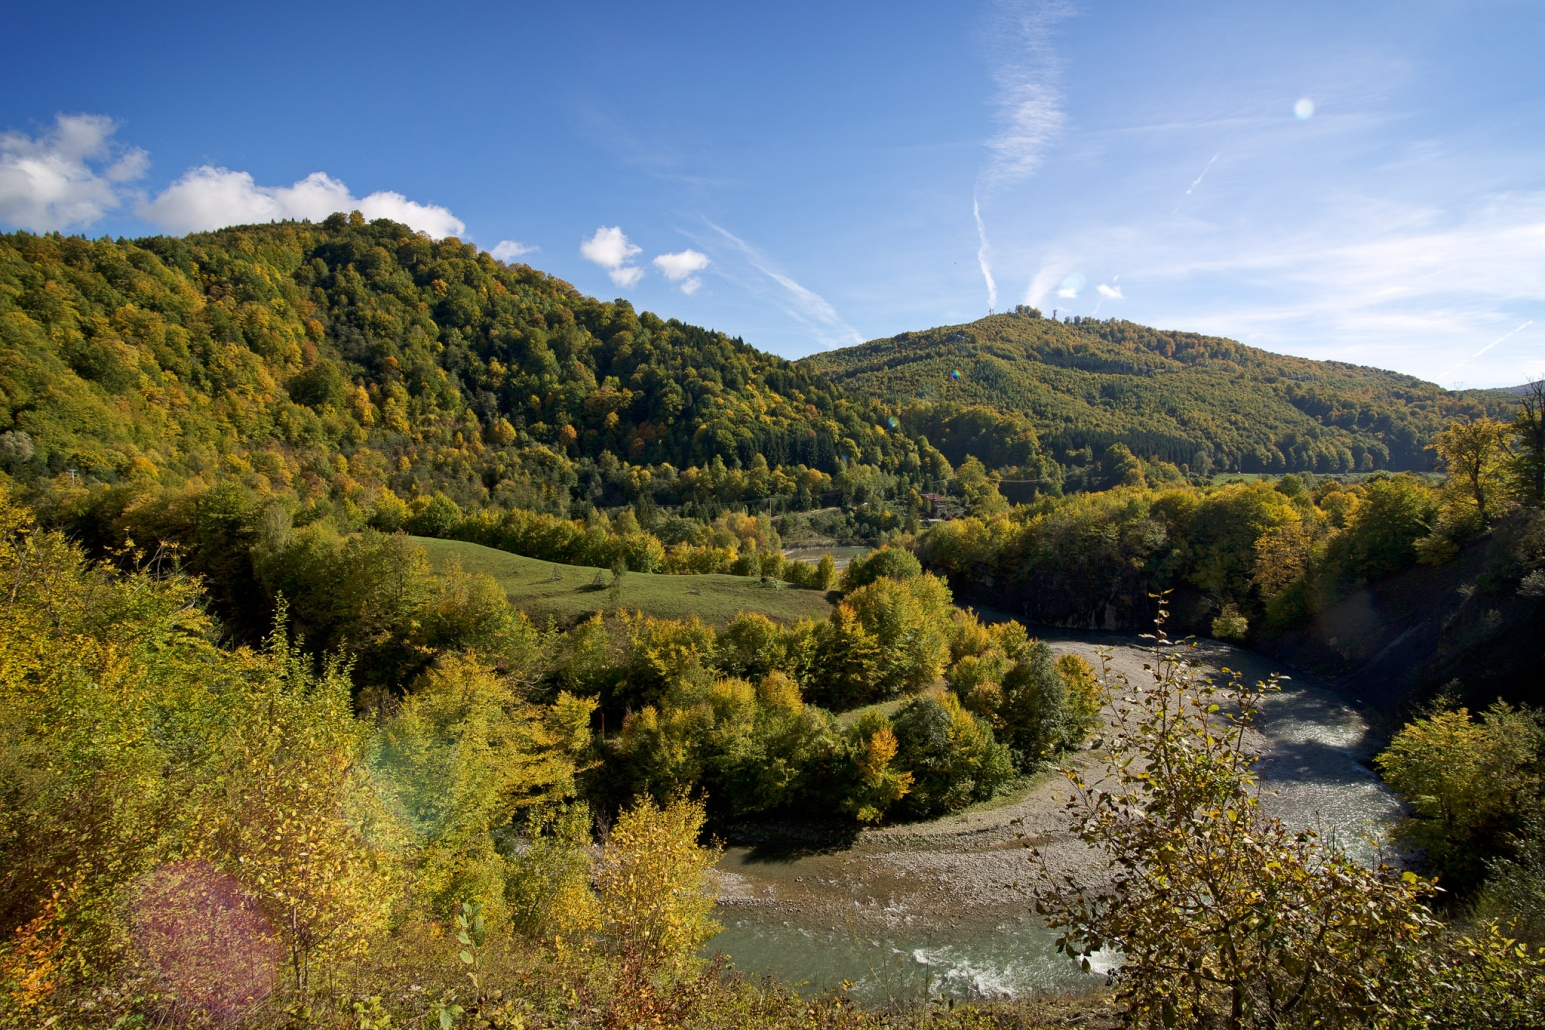 Peisaj din România, Valea Doftanei